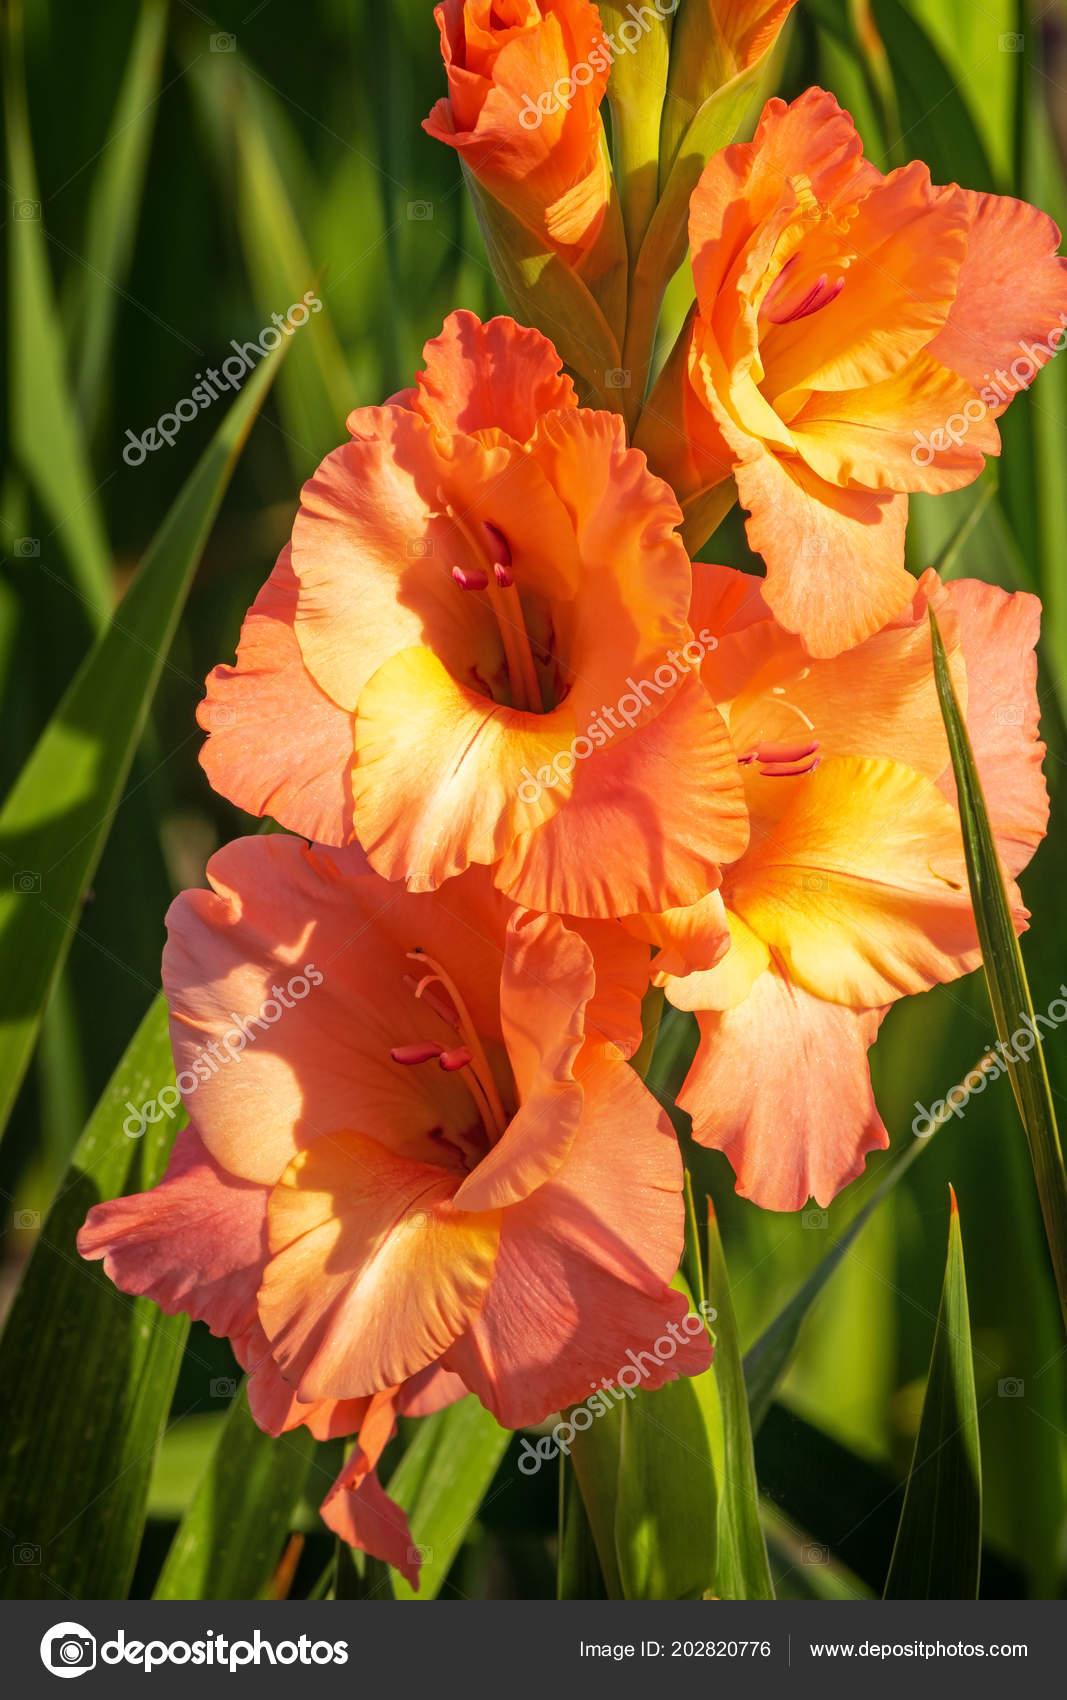 Gladiolus close beautiful flowers blooming garden stock photo gladiolus close beautiful flowers blooming garden stock photo izmirmasajfo